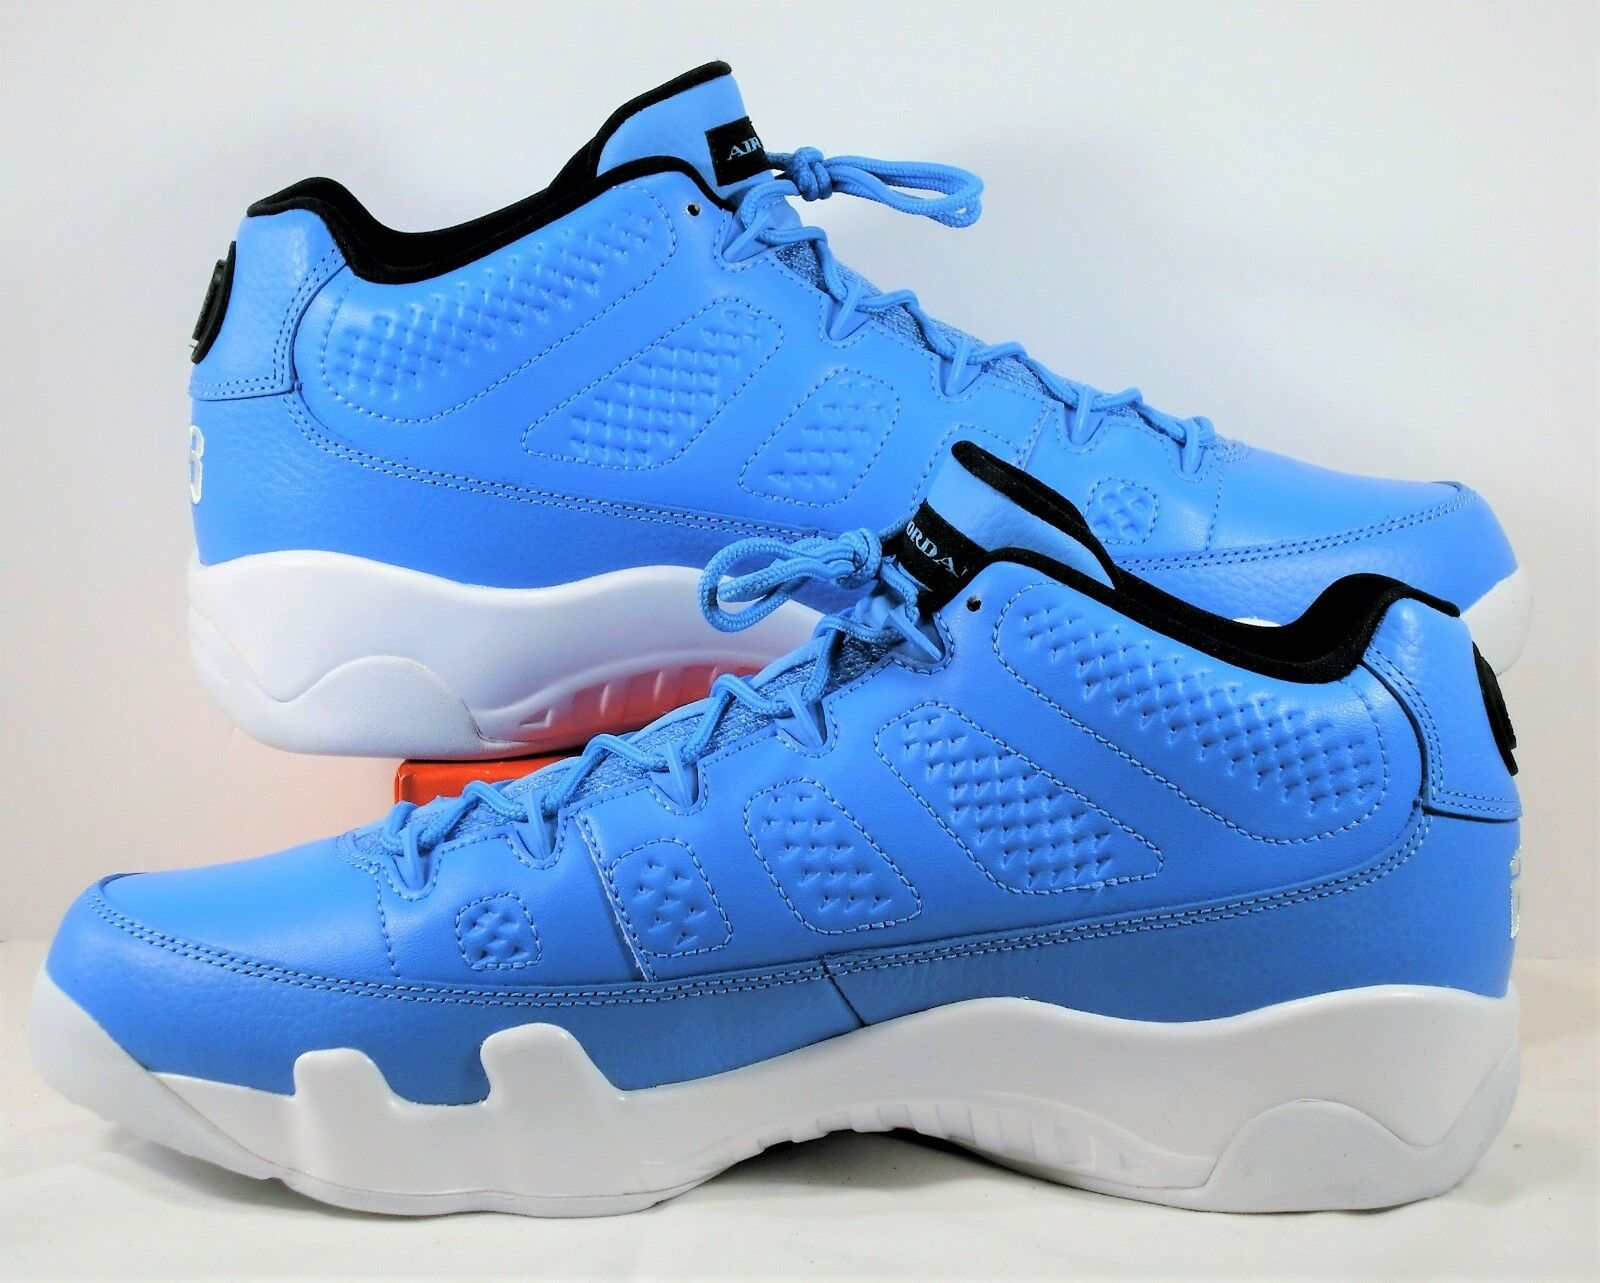 sports shoes d36fe 624e9 Nike Air Max 95 Printed Just Do It It It Black Bright Crimson Orange White  AQ9711